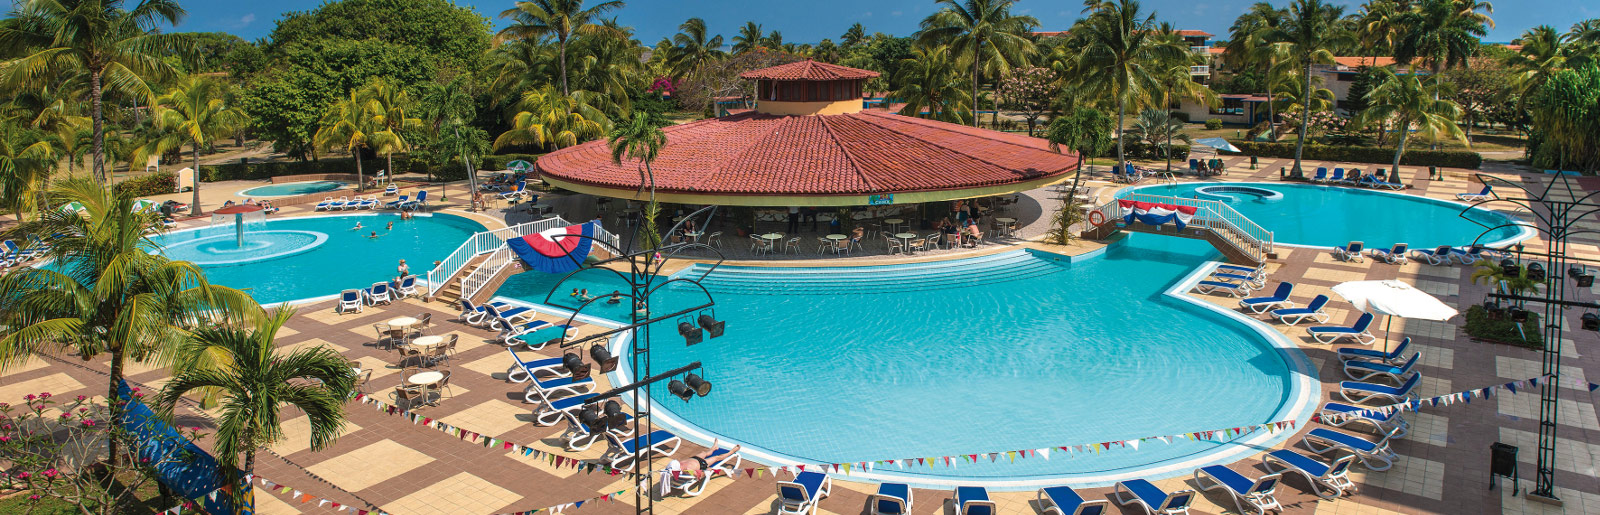 Pool Hotele Experiencie Varadero - Be Live